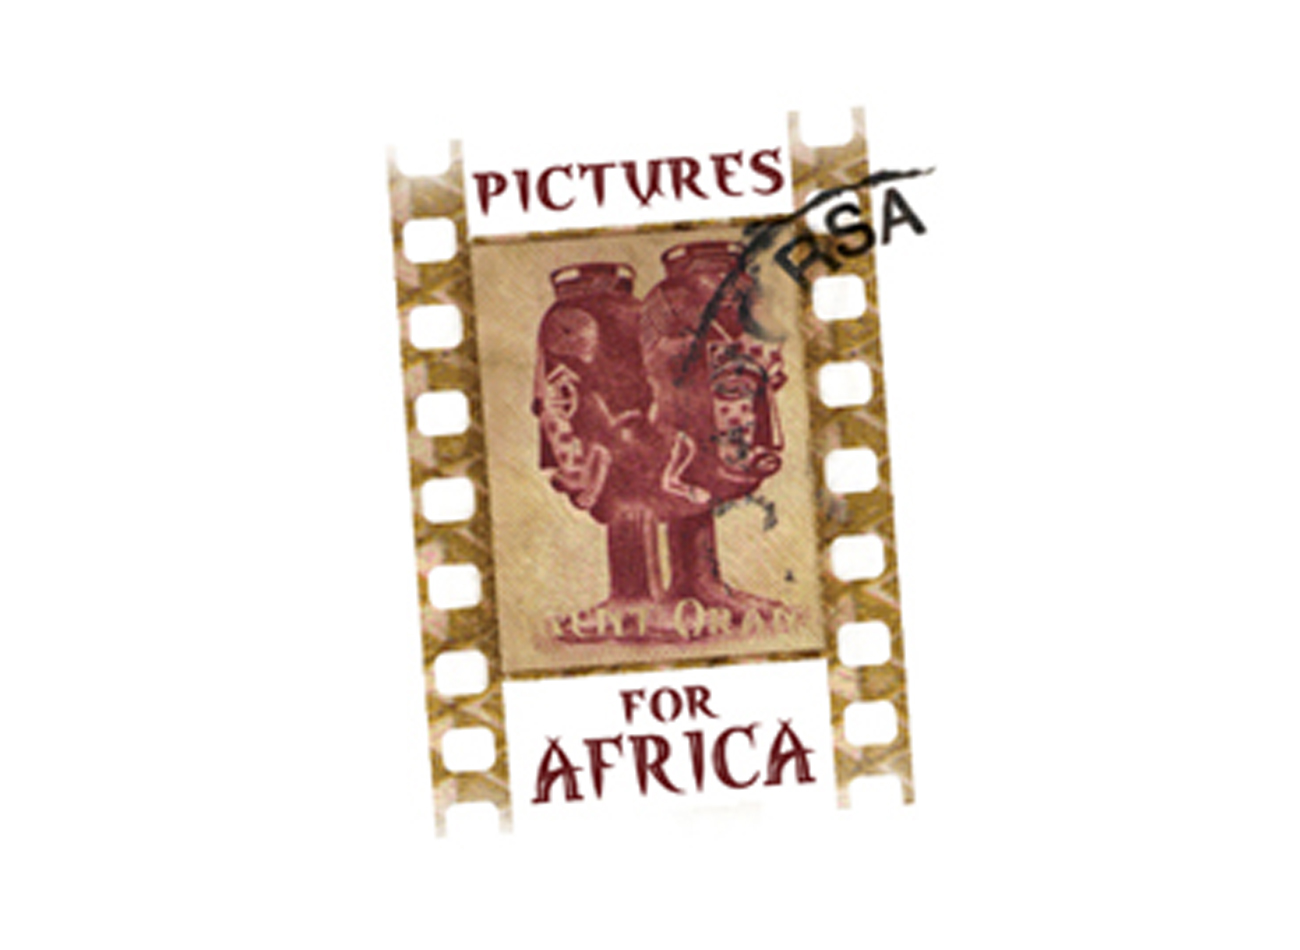 pictures-for-africa-illustrative-logo-agent-orange-design.jpg